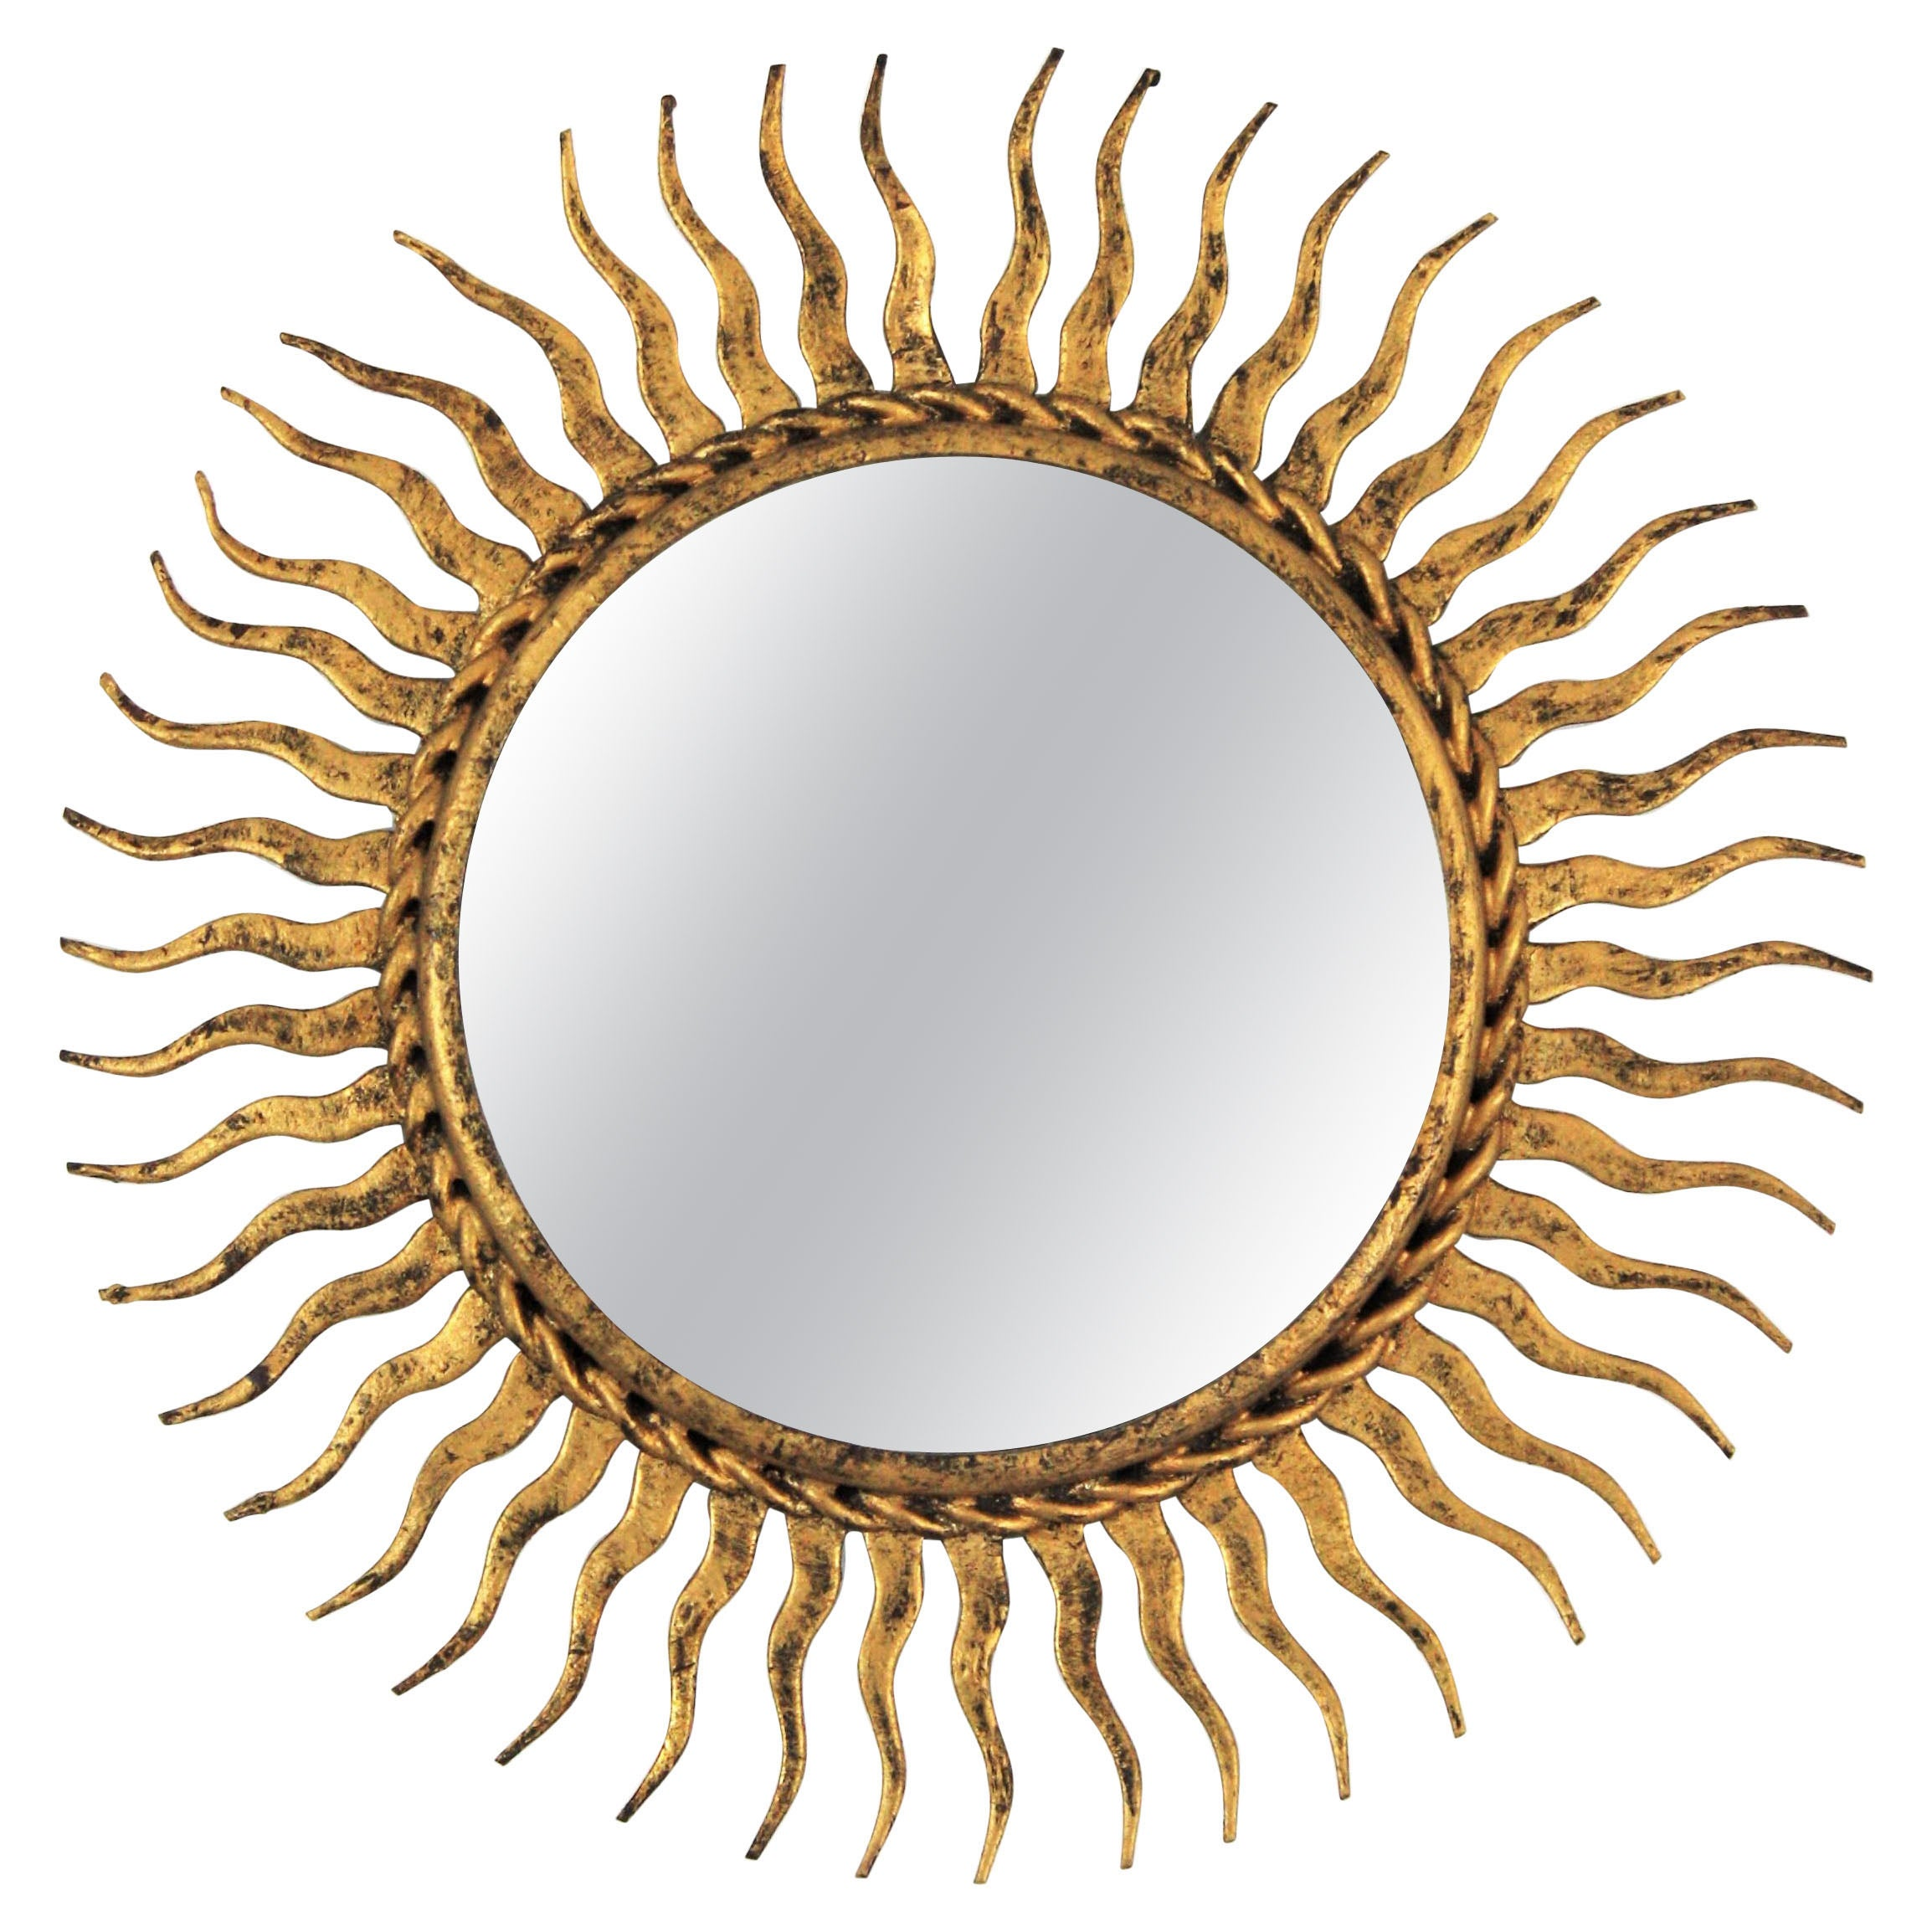 Sunburst Mirror in Small Scale, Gilt Wrought Iron